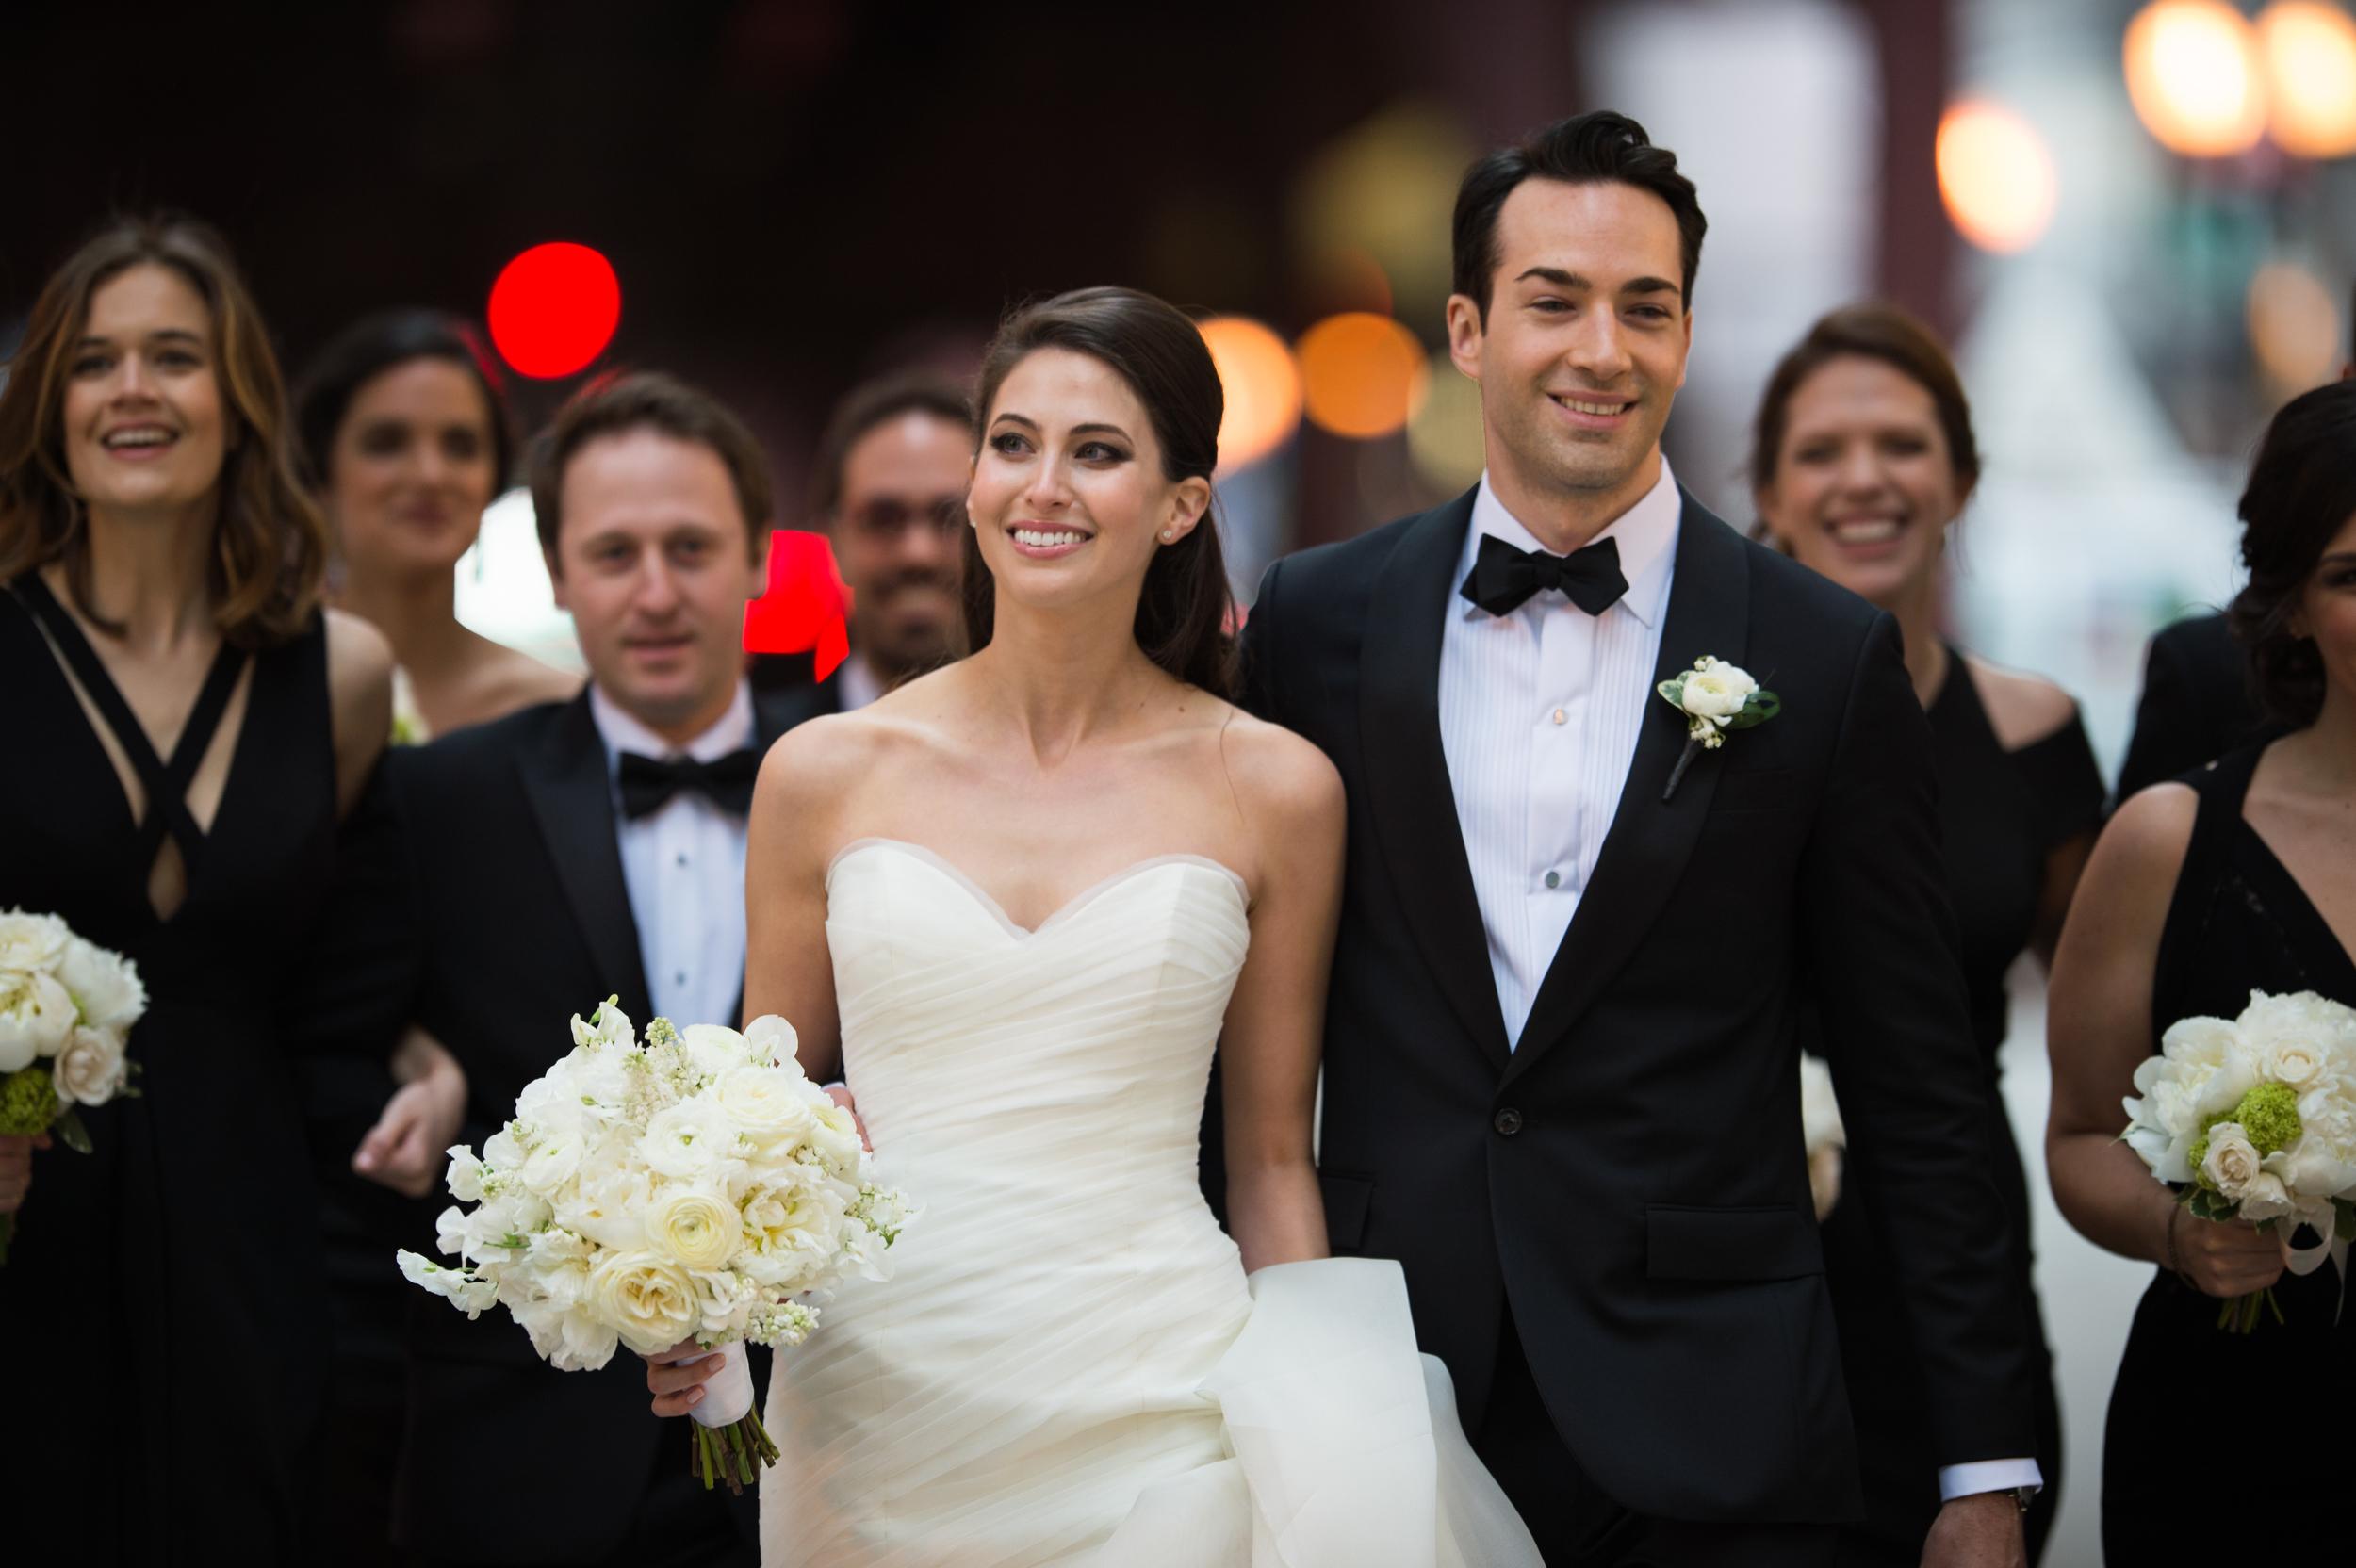 wedding photos in downtown chicago.jpg